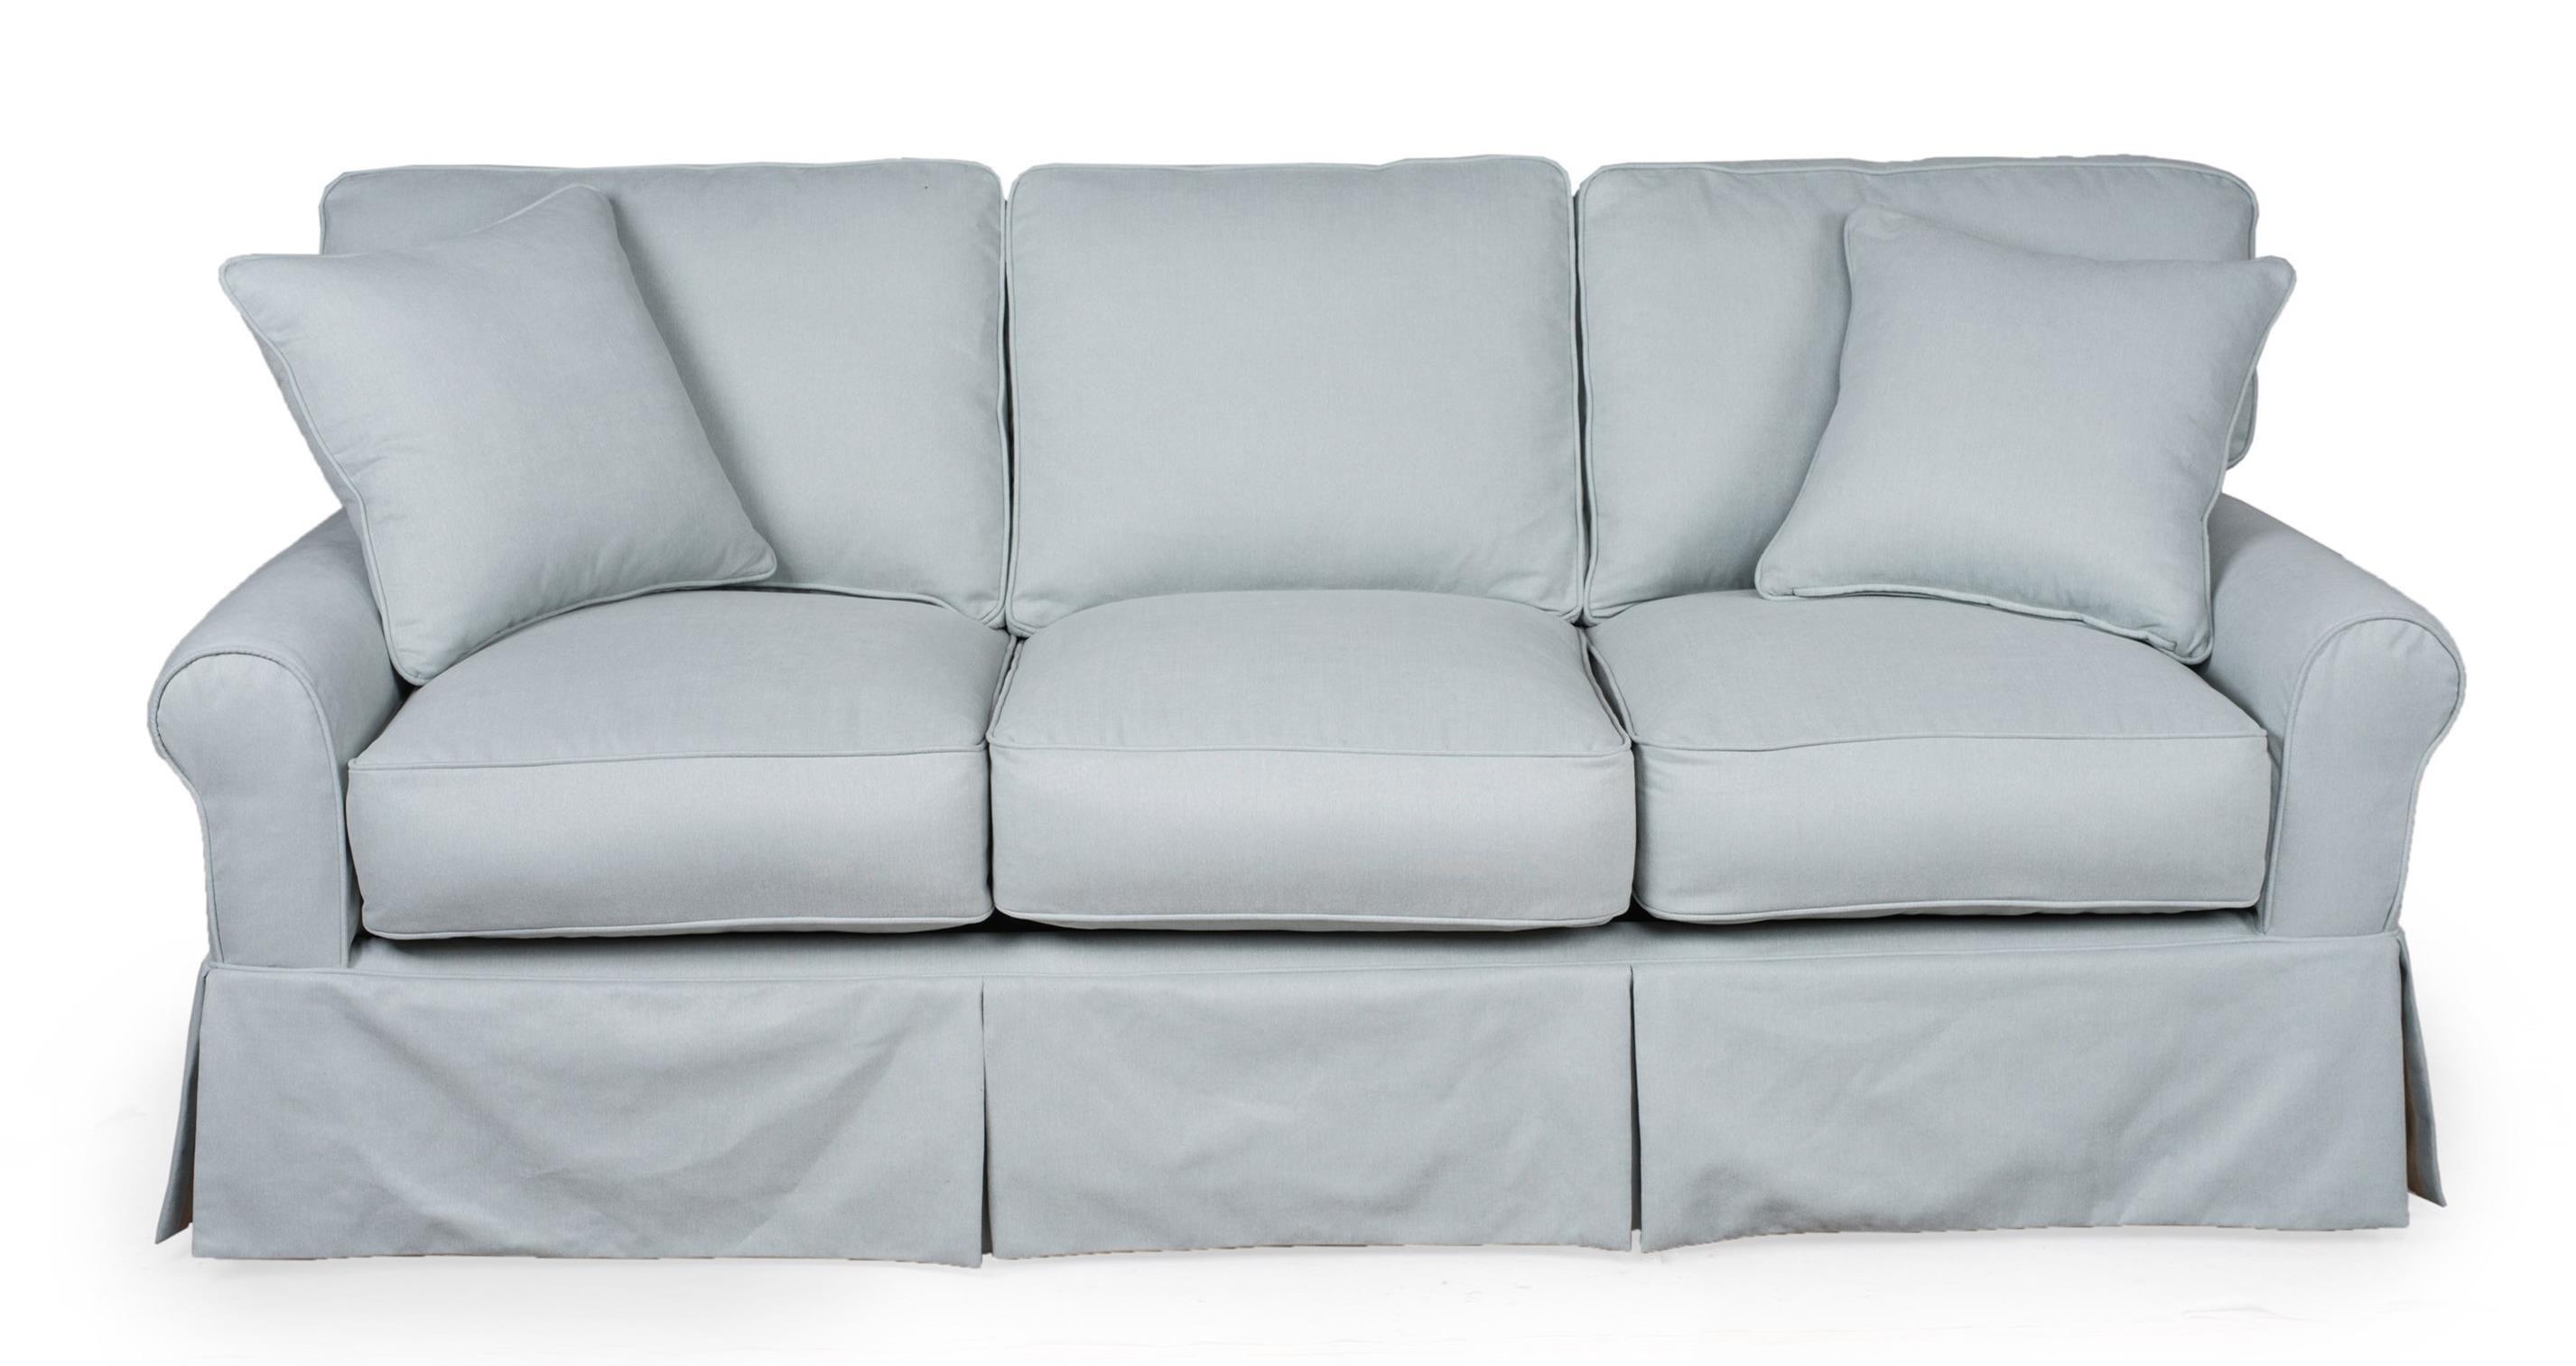 1313 Sofa Sleeper by Synergy Home Furnishings at Johnny Janosik